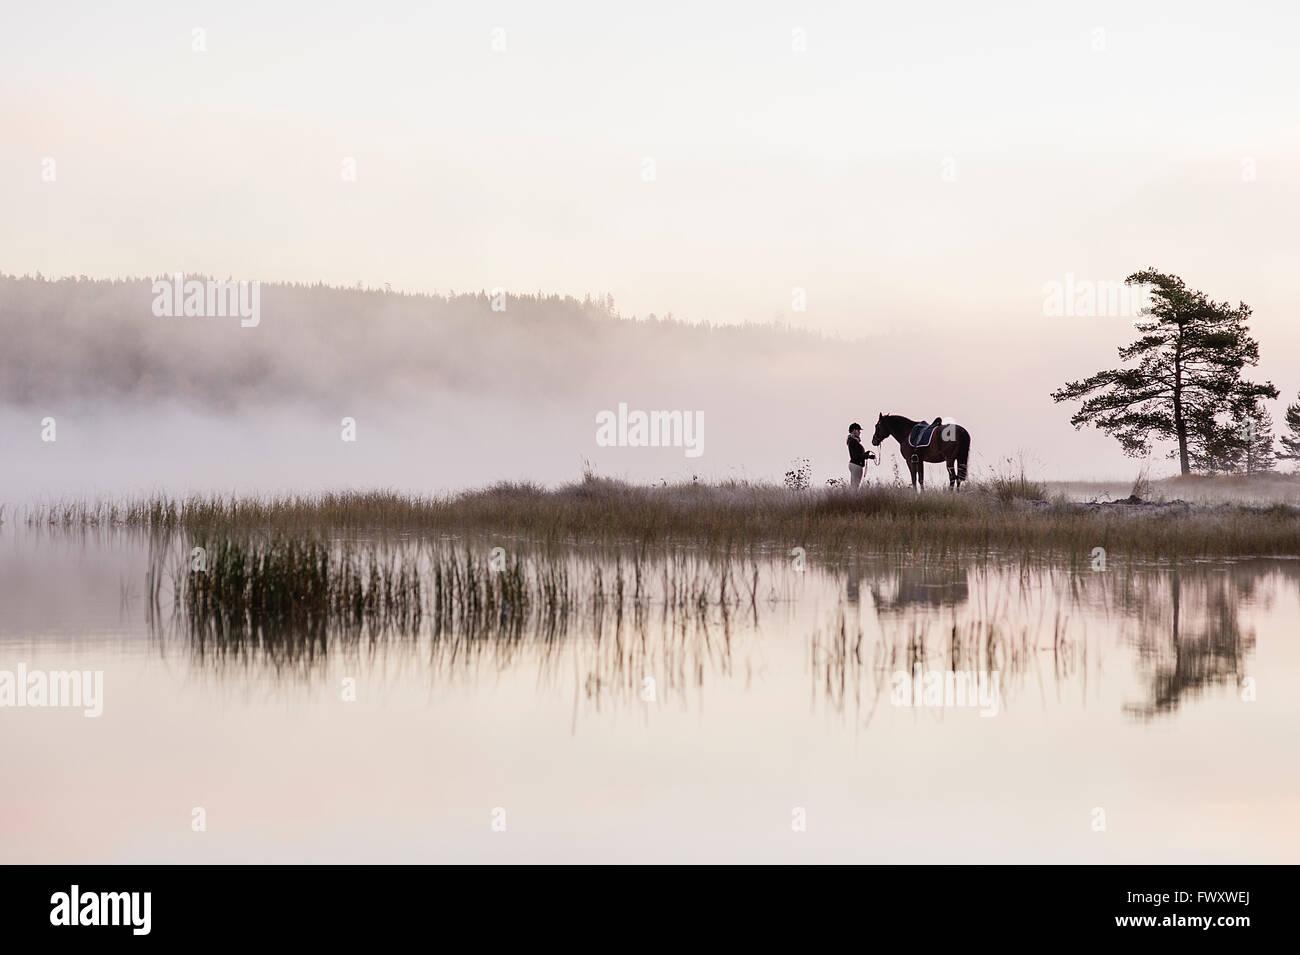 Schweden, Vastmanland, Bergslagen, Hällefors, Grythyttan, Bovik, junge Frau mit Pferd am Seeufer Stockbild